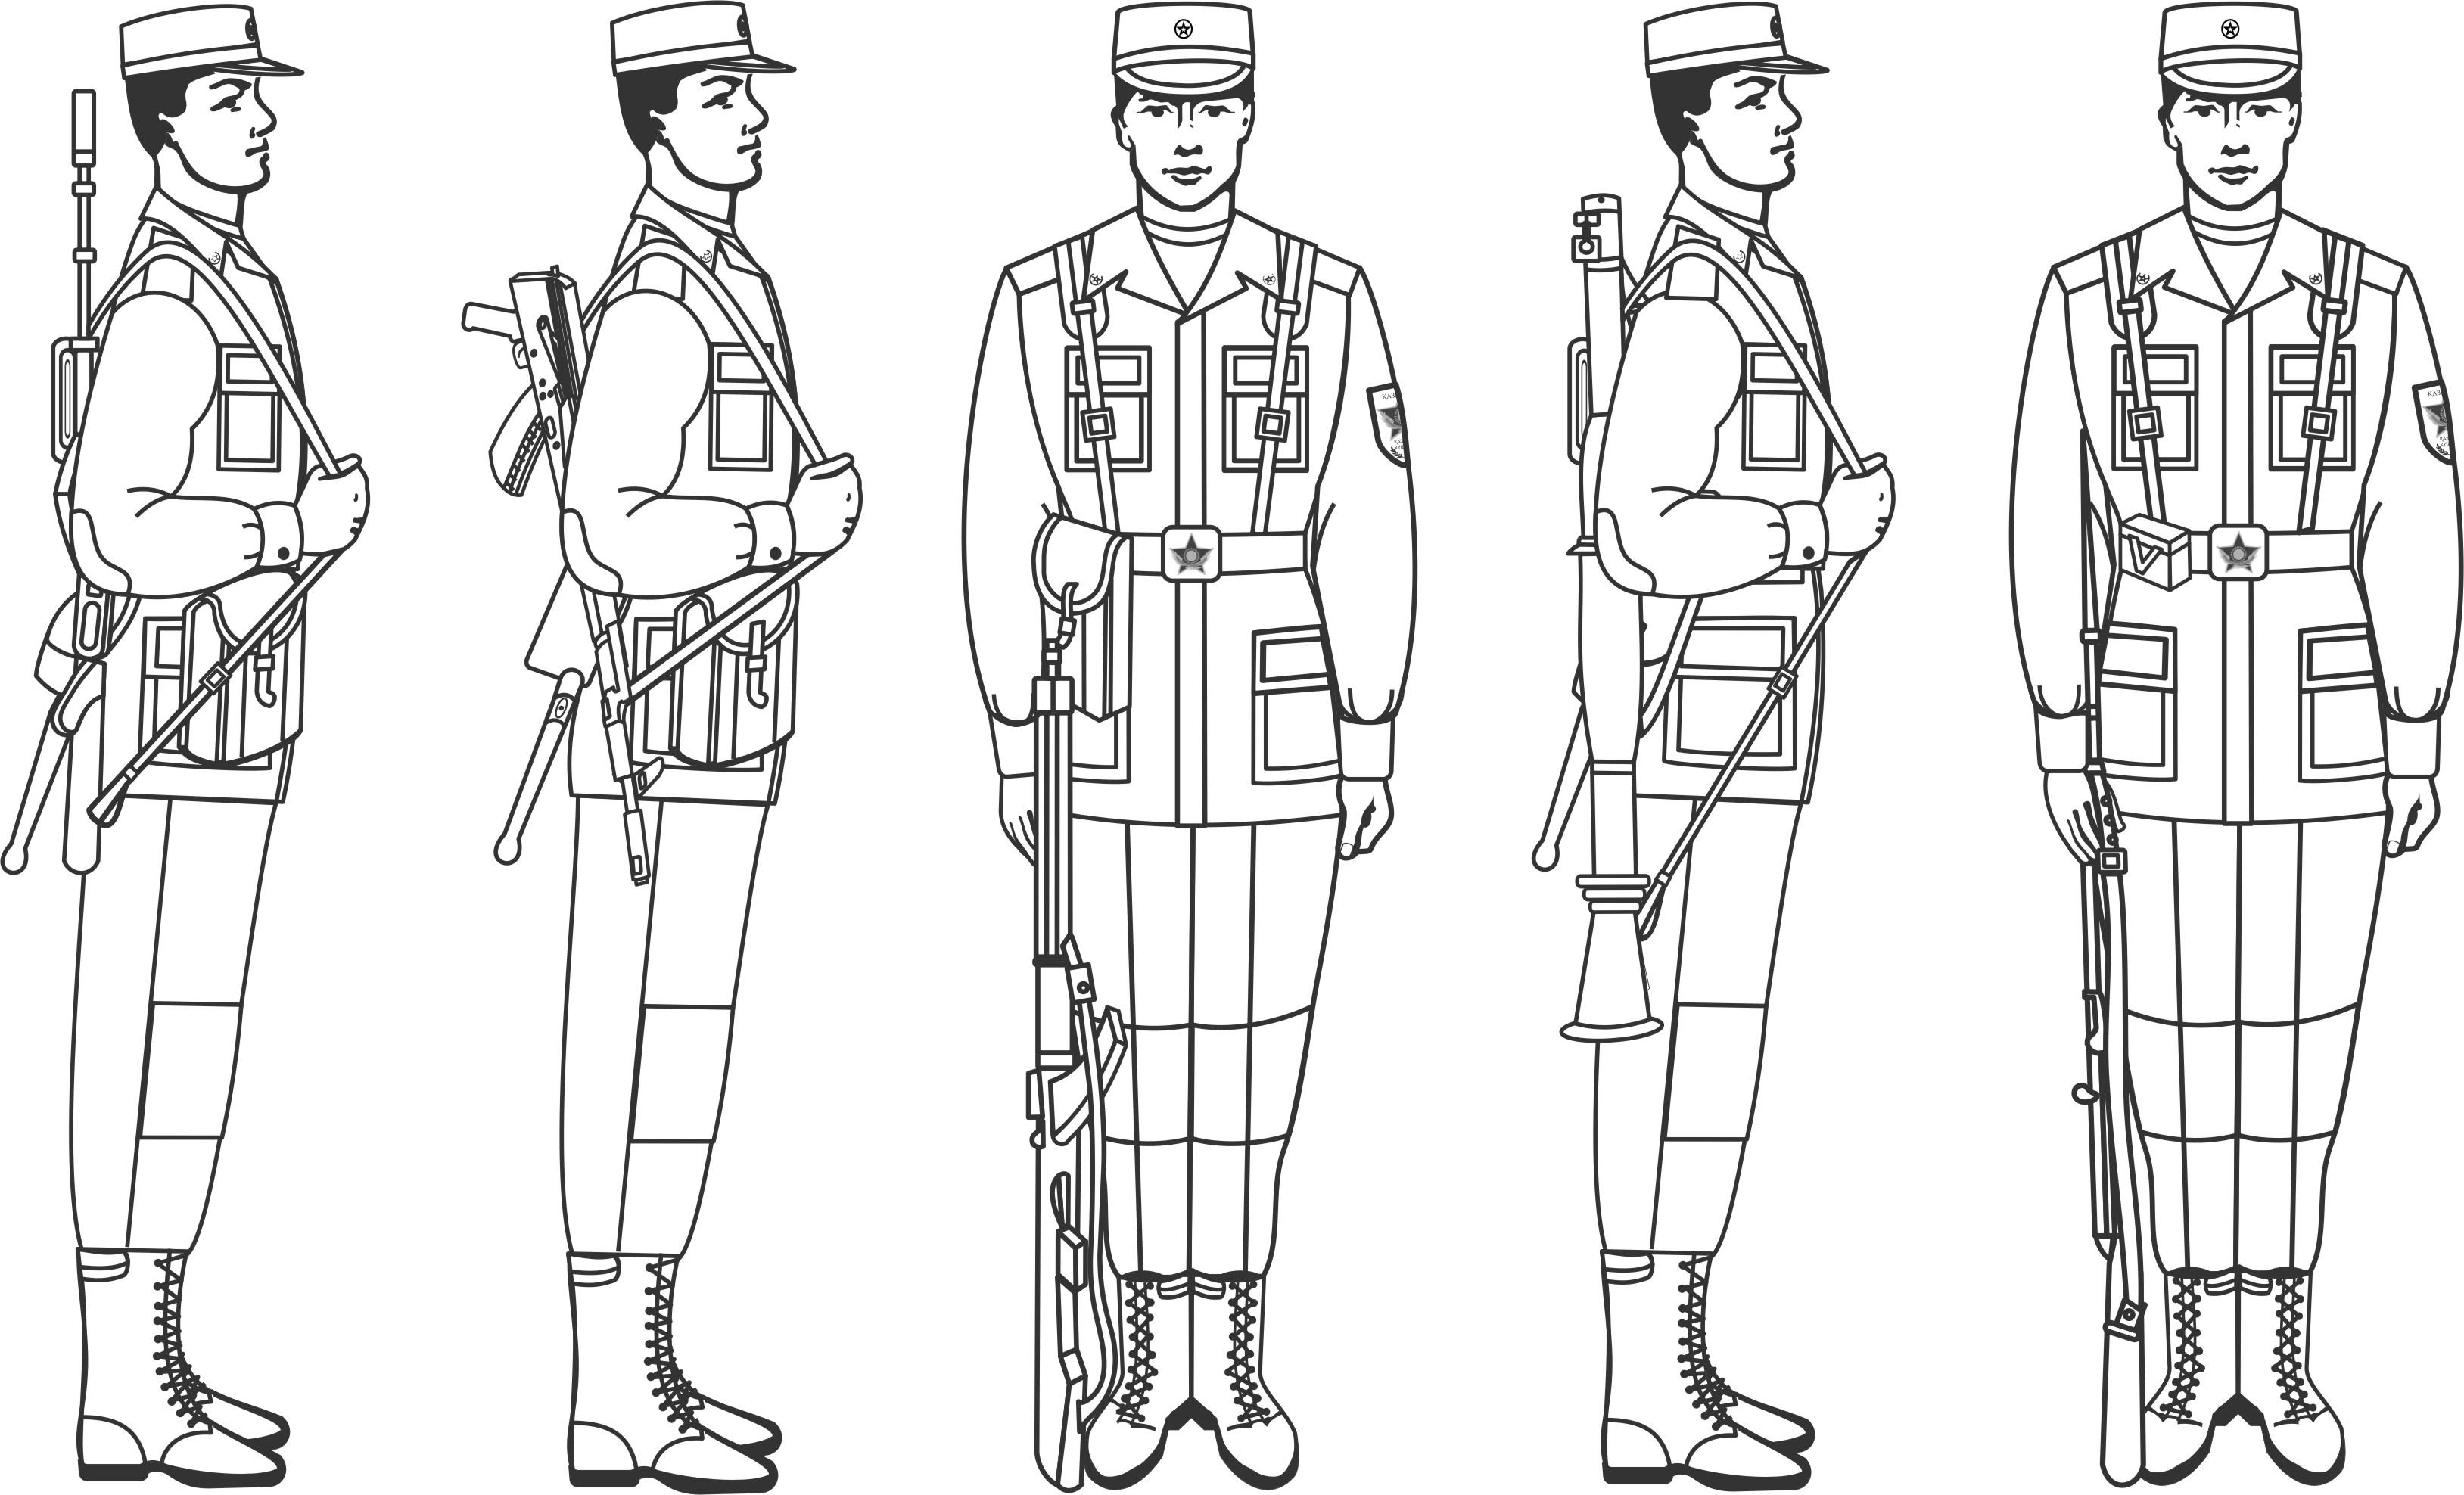 картинки карандашом солдаты в строю шампуре такое необычное